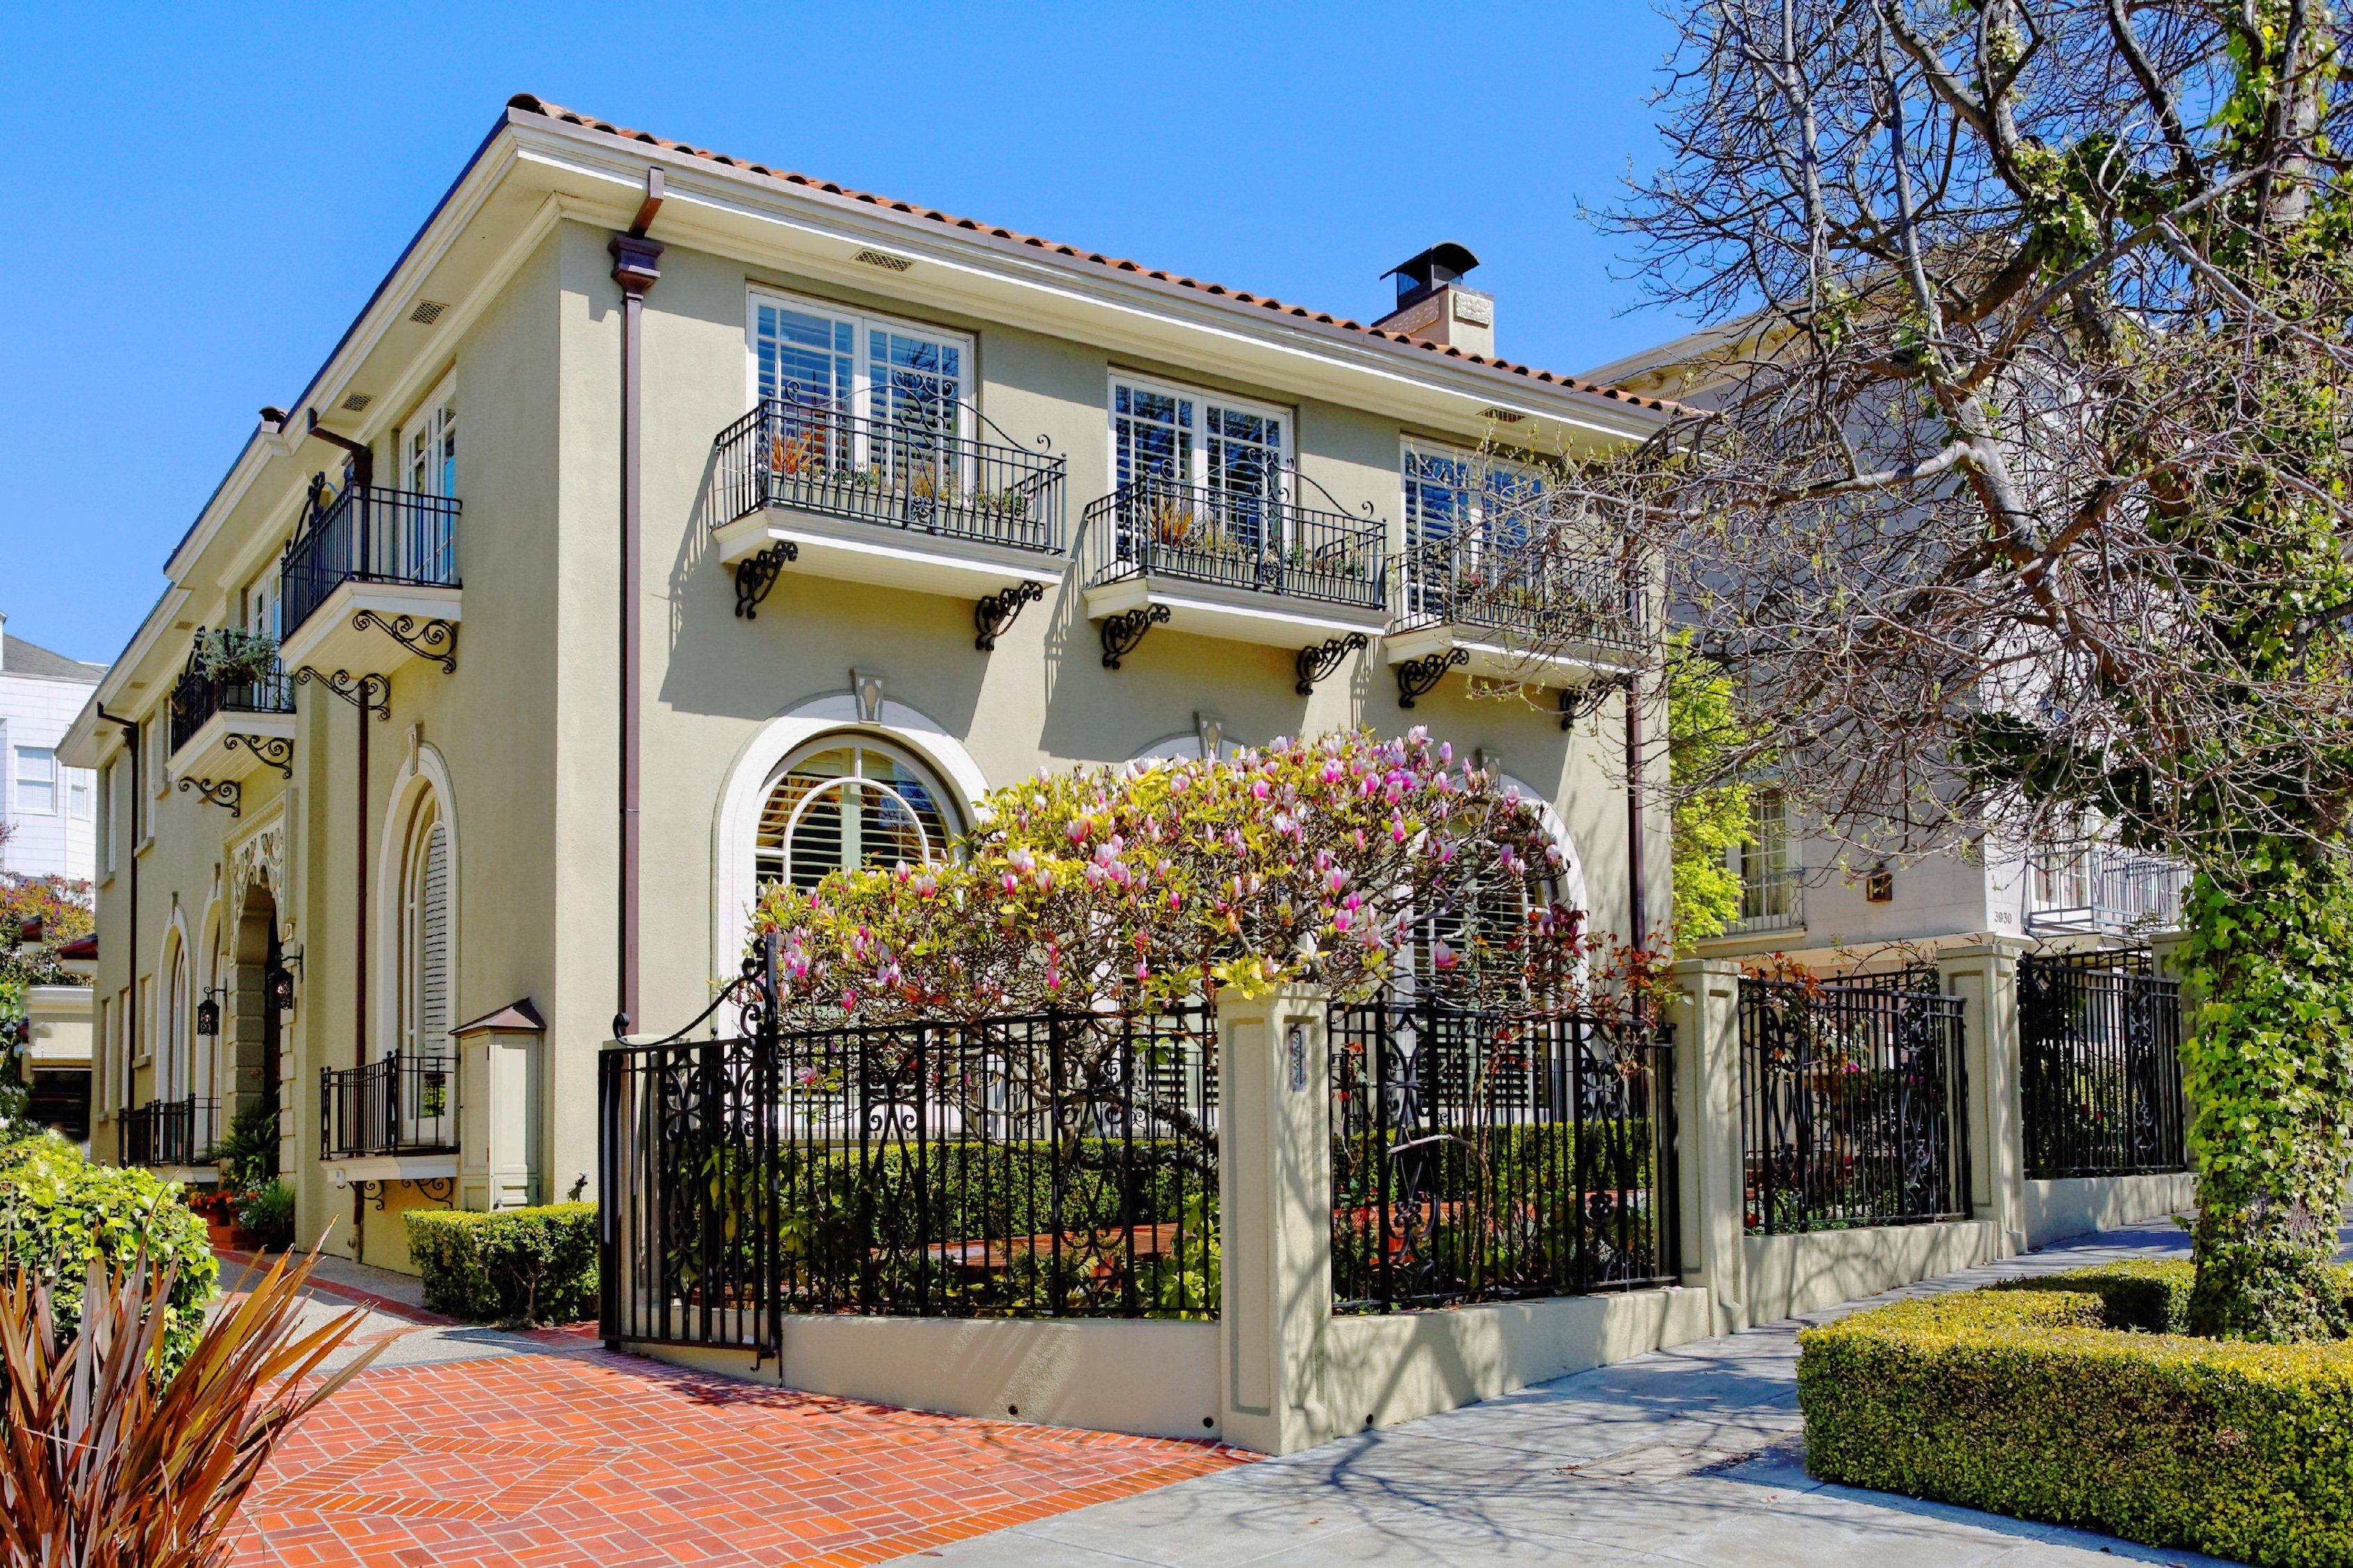 Robert R. Callan Jr. - McGuire Real Estate image 13